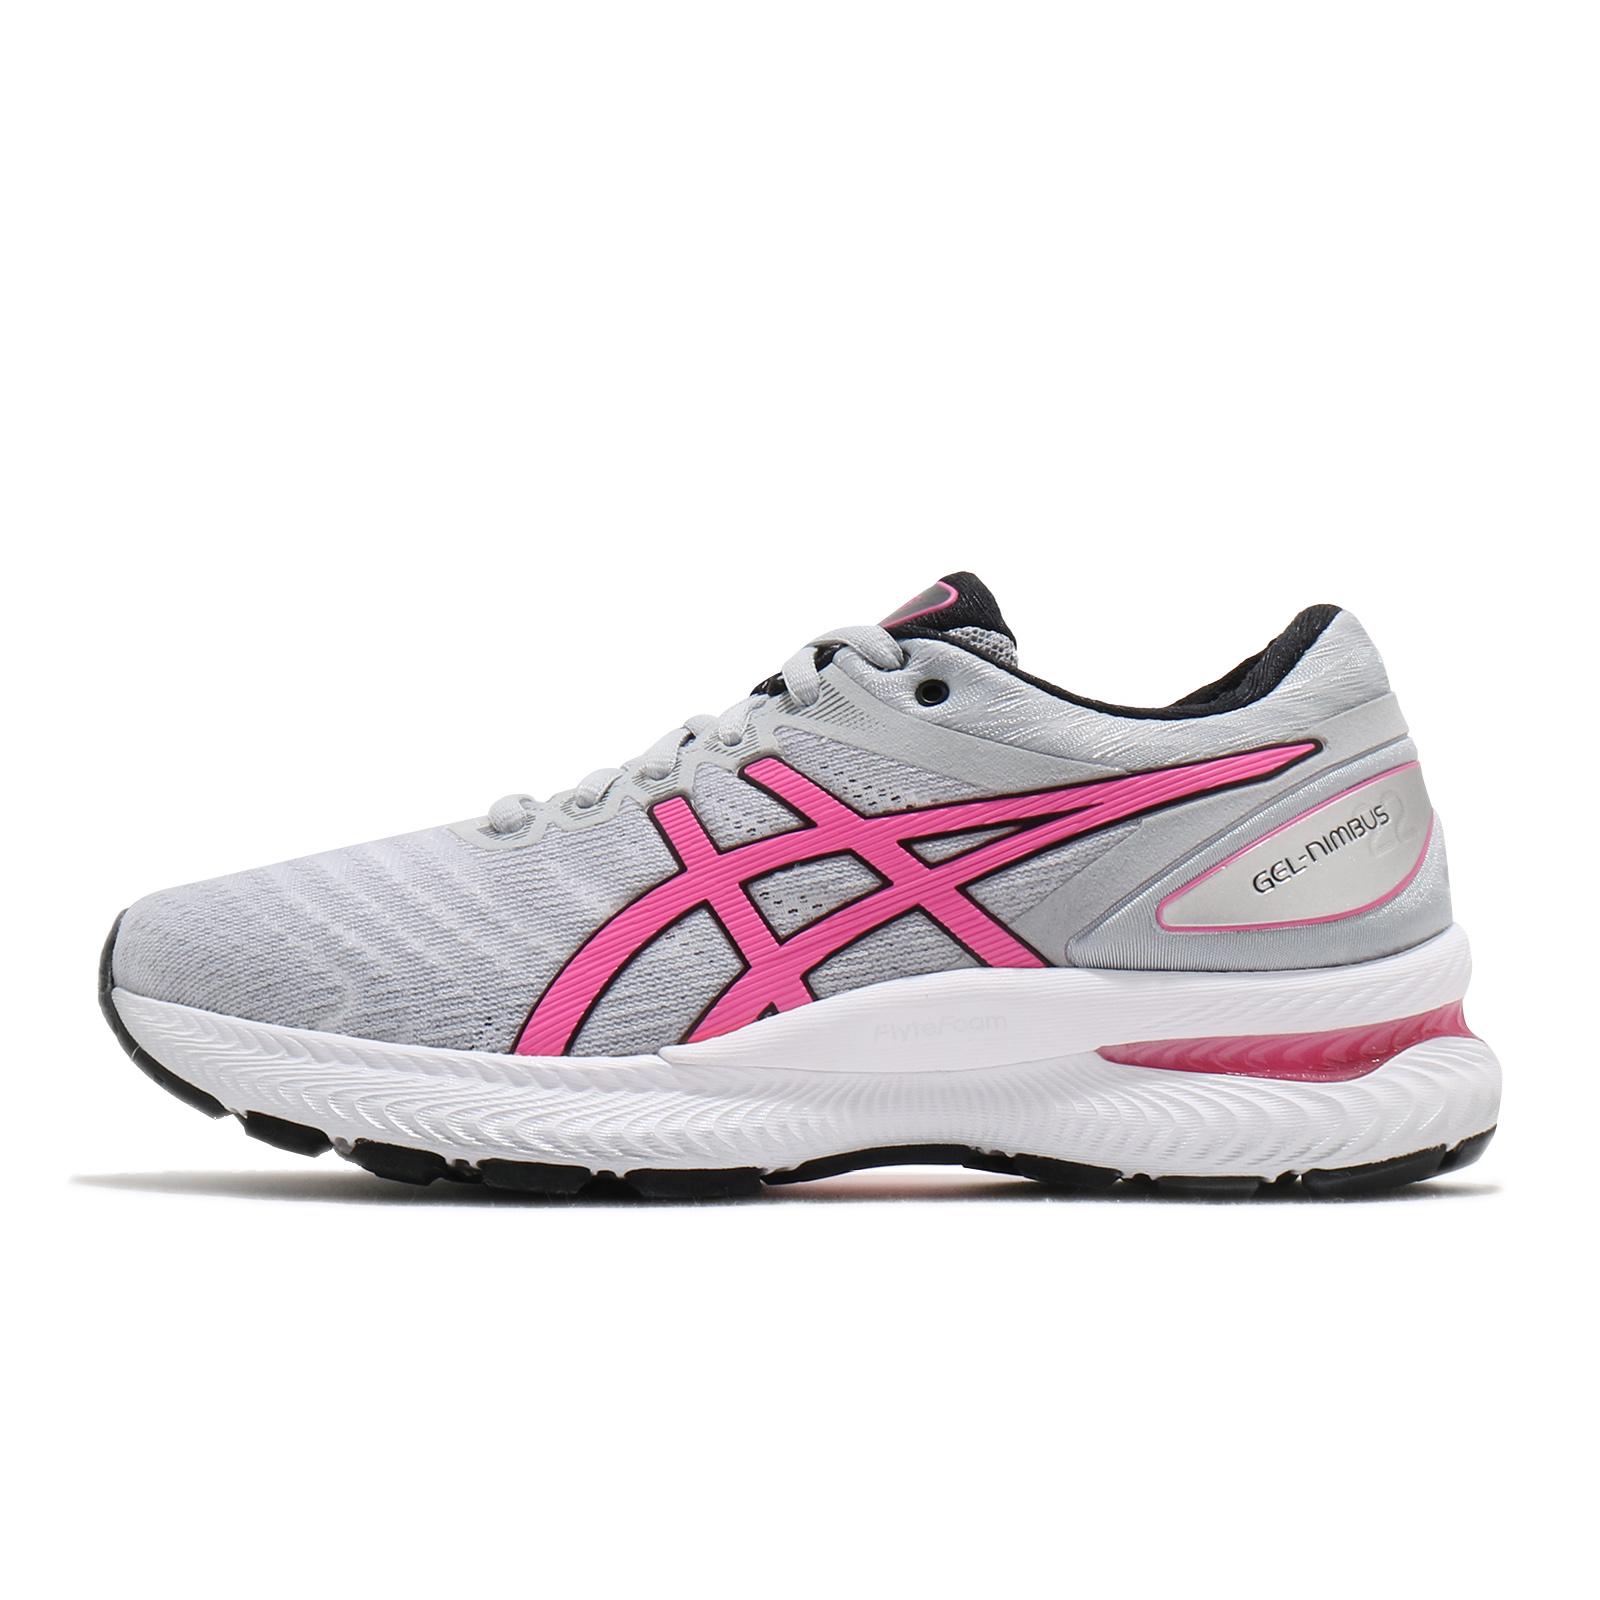 Asics 慢跑鞋 Gel-Nimbus 22 灰 粉紅 亞瑟士 女鞋 亞瑟膠 【ACS】 1012A587-021